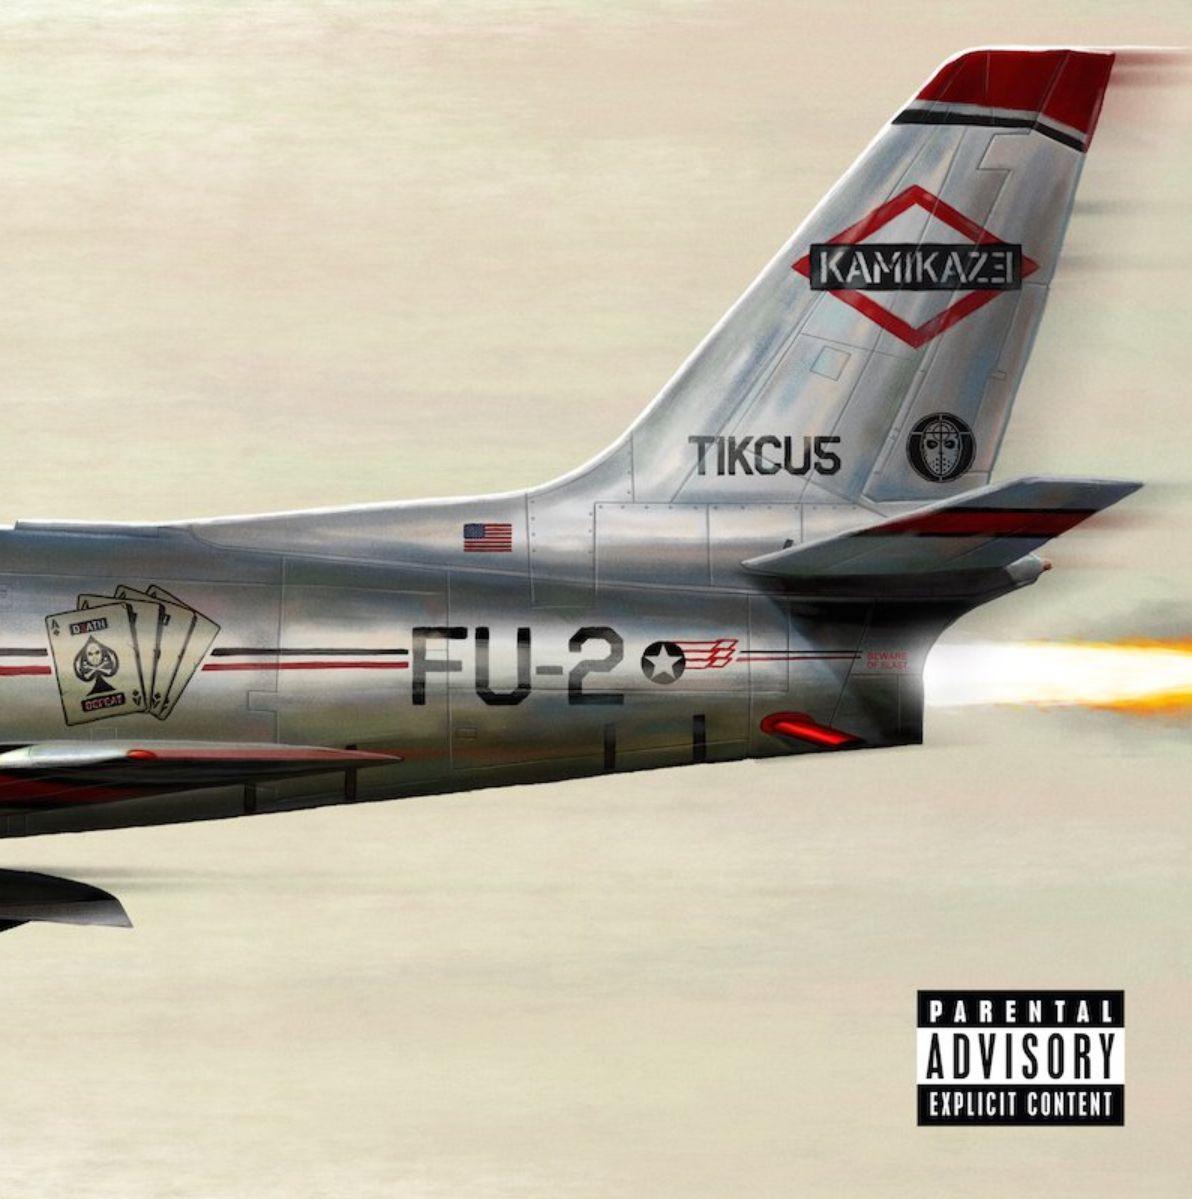 Eminem, Gaga and The Rock